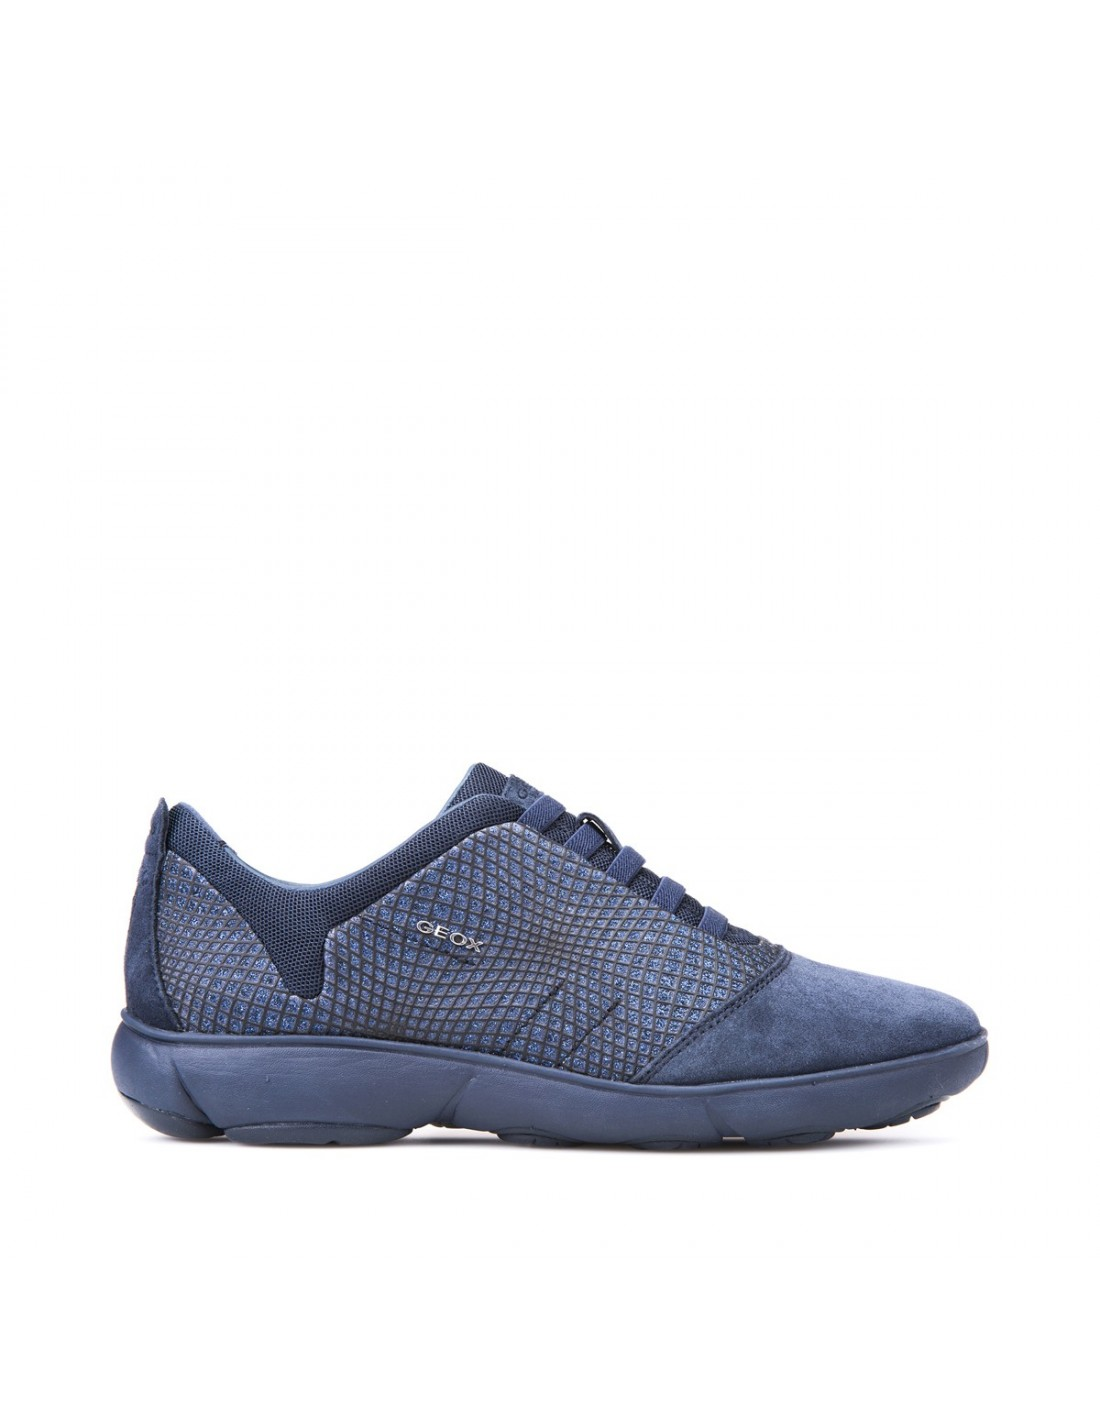 Geox scarpe donna sneakers slip on in camoscio navy linea nebula D741EA, comode Angela Barba